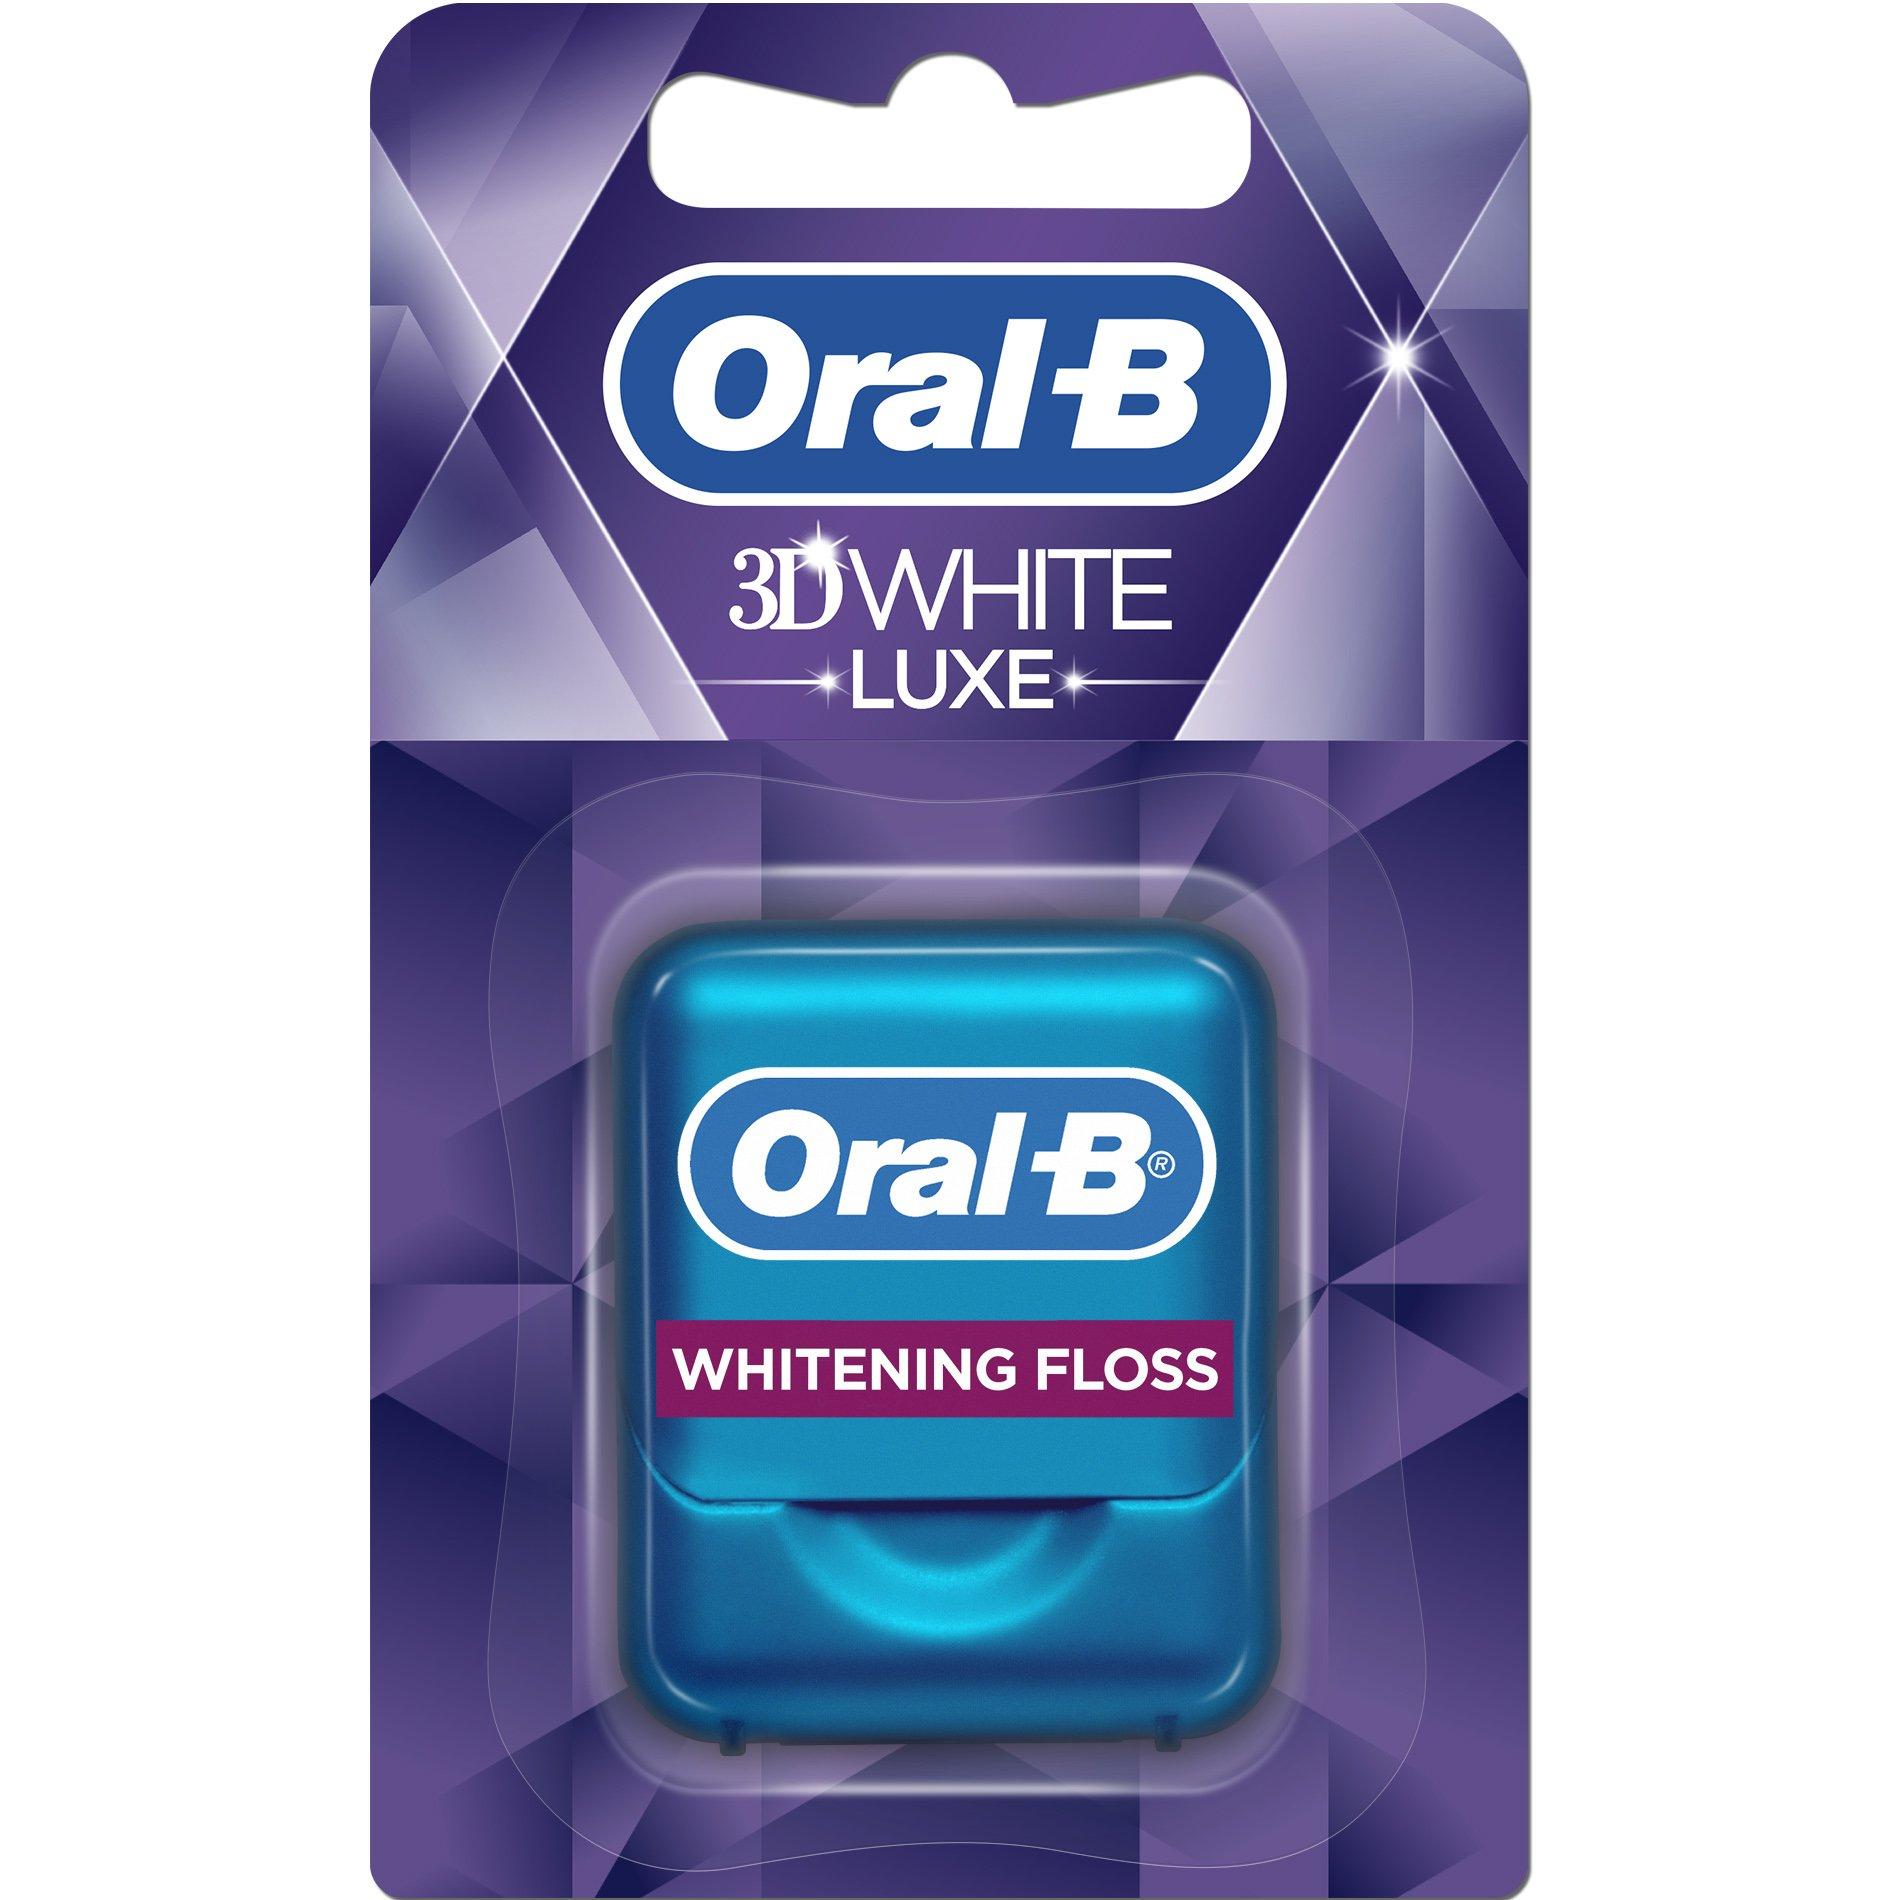 Oral-B 3DWhite Luxe Οδοντικό Νήμα για την Πρόληψη Λεκέδων 35m